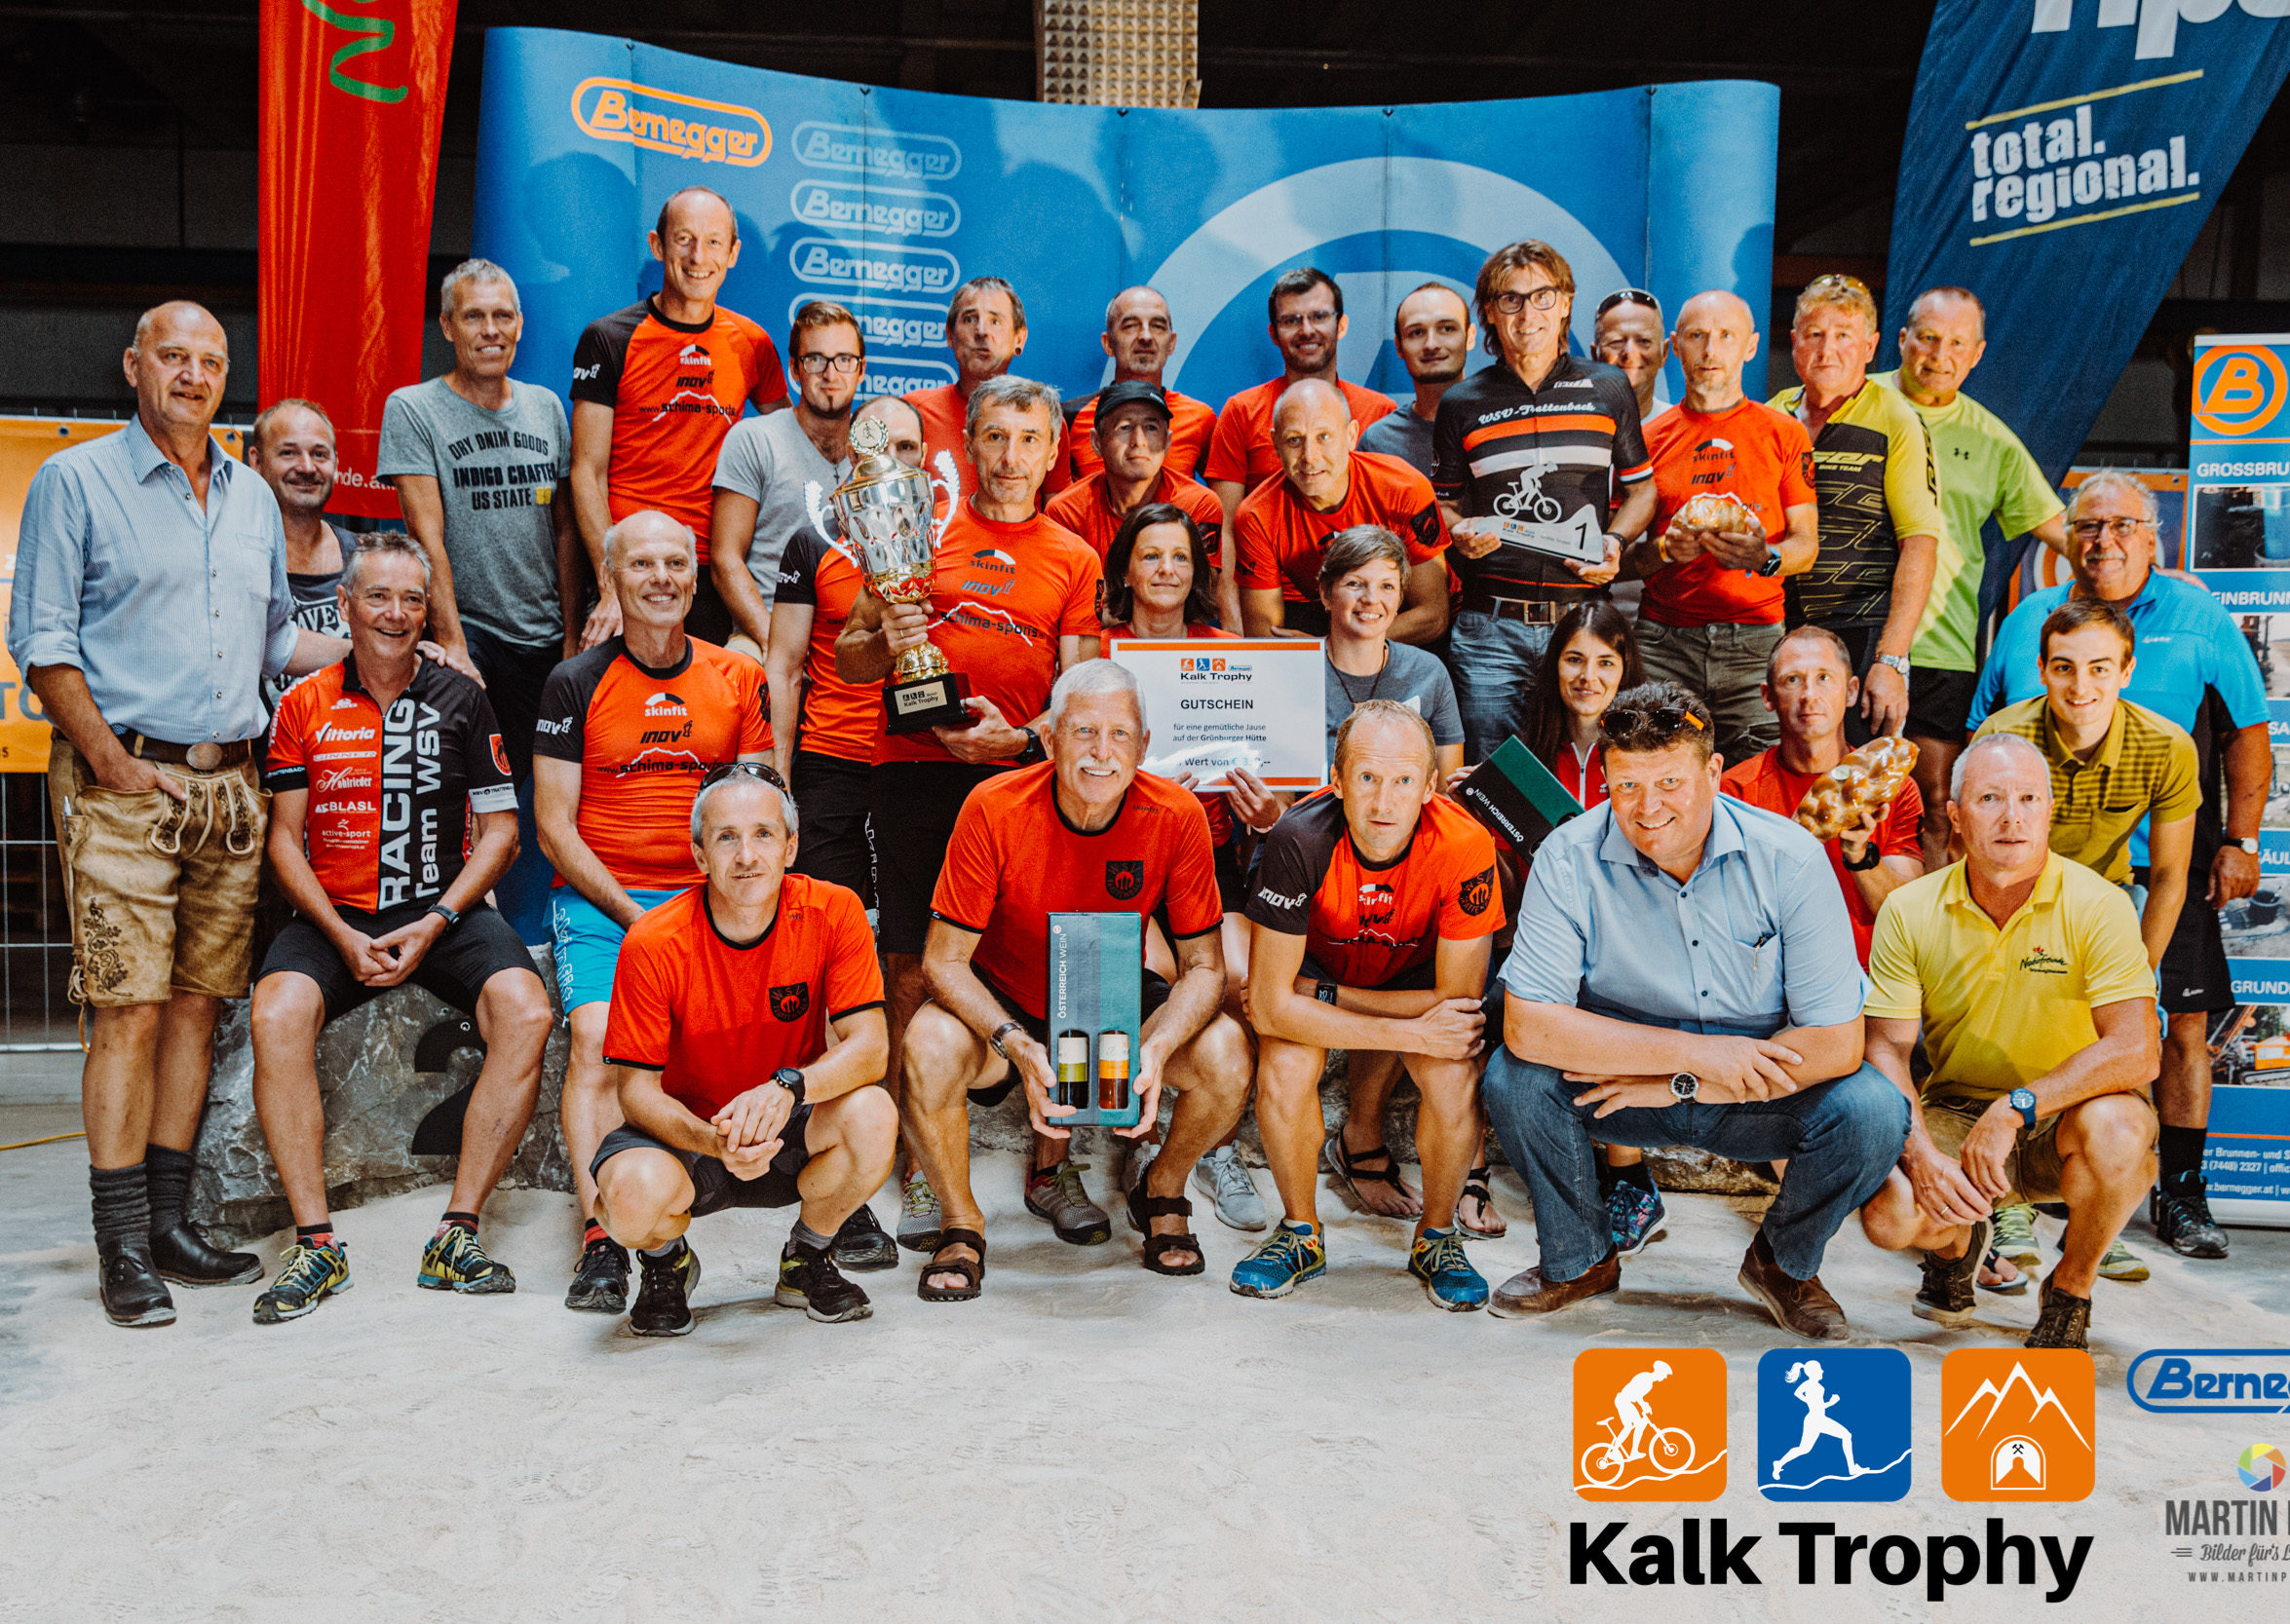 Kalk Trophy fest in der Hand des WSV